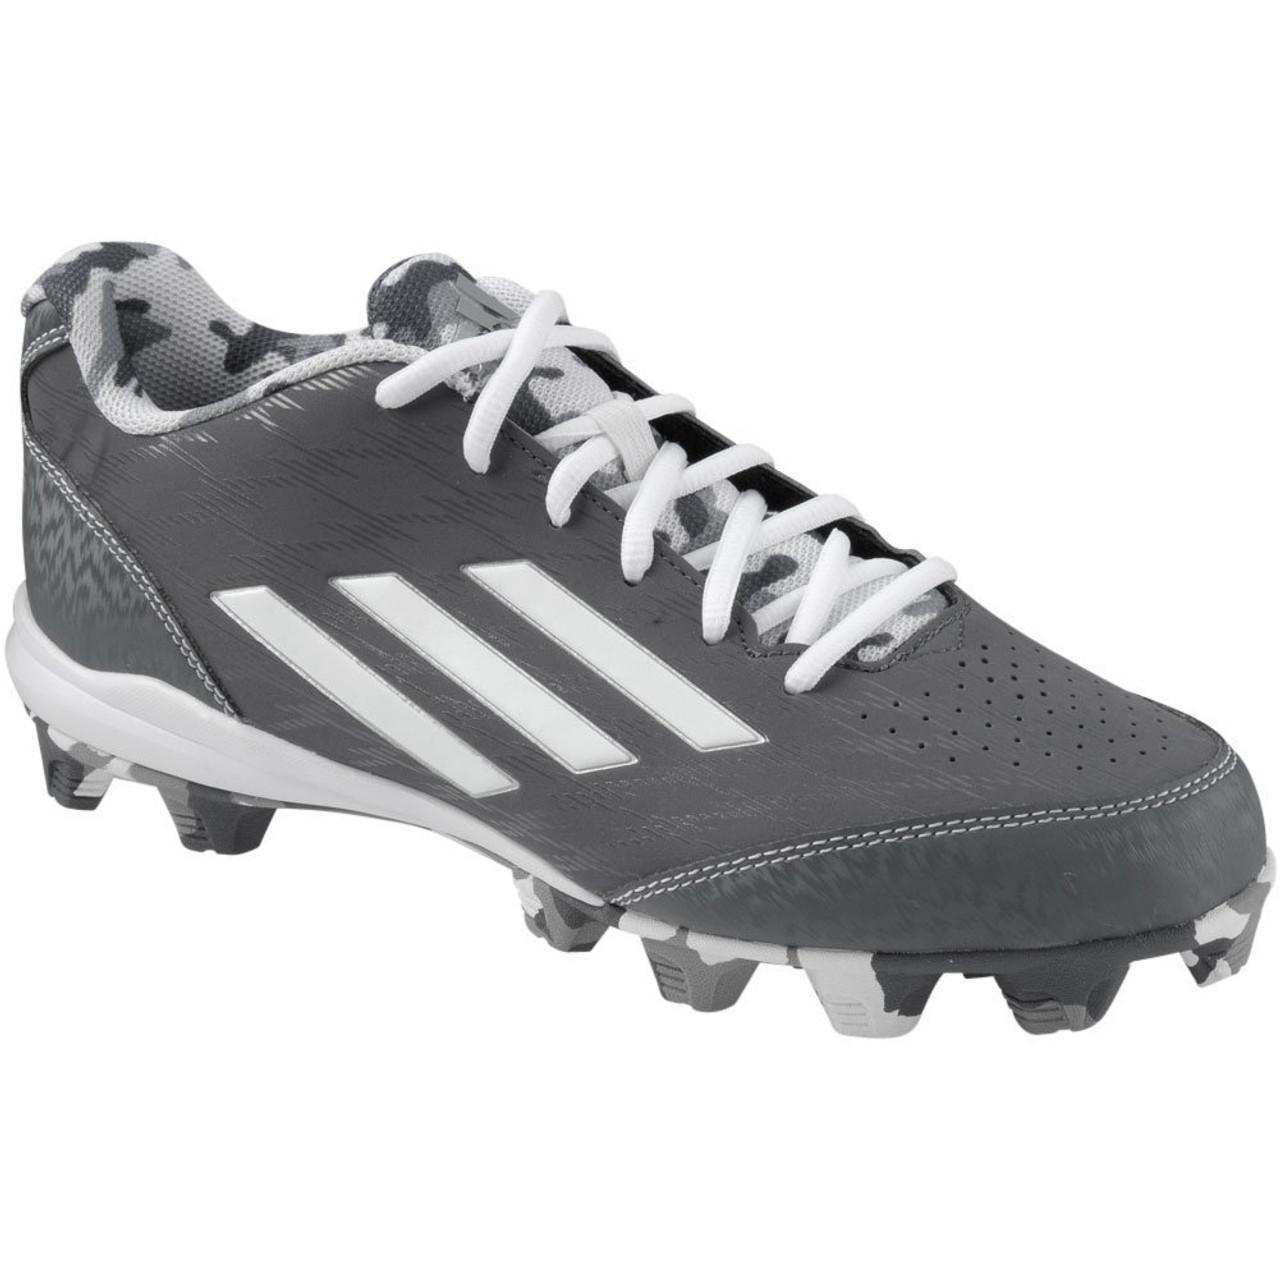 Adidas Wheelhouse 3 S84778 Baseball Cleat - Onix White Grey 2c18b977552